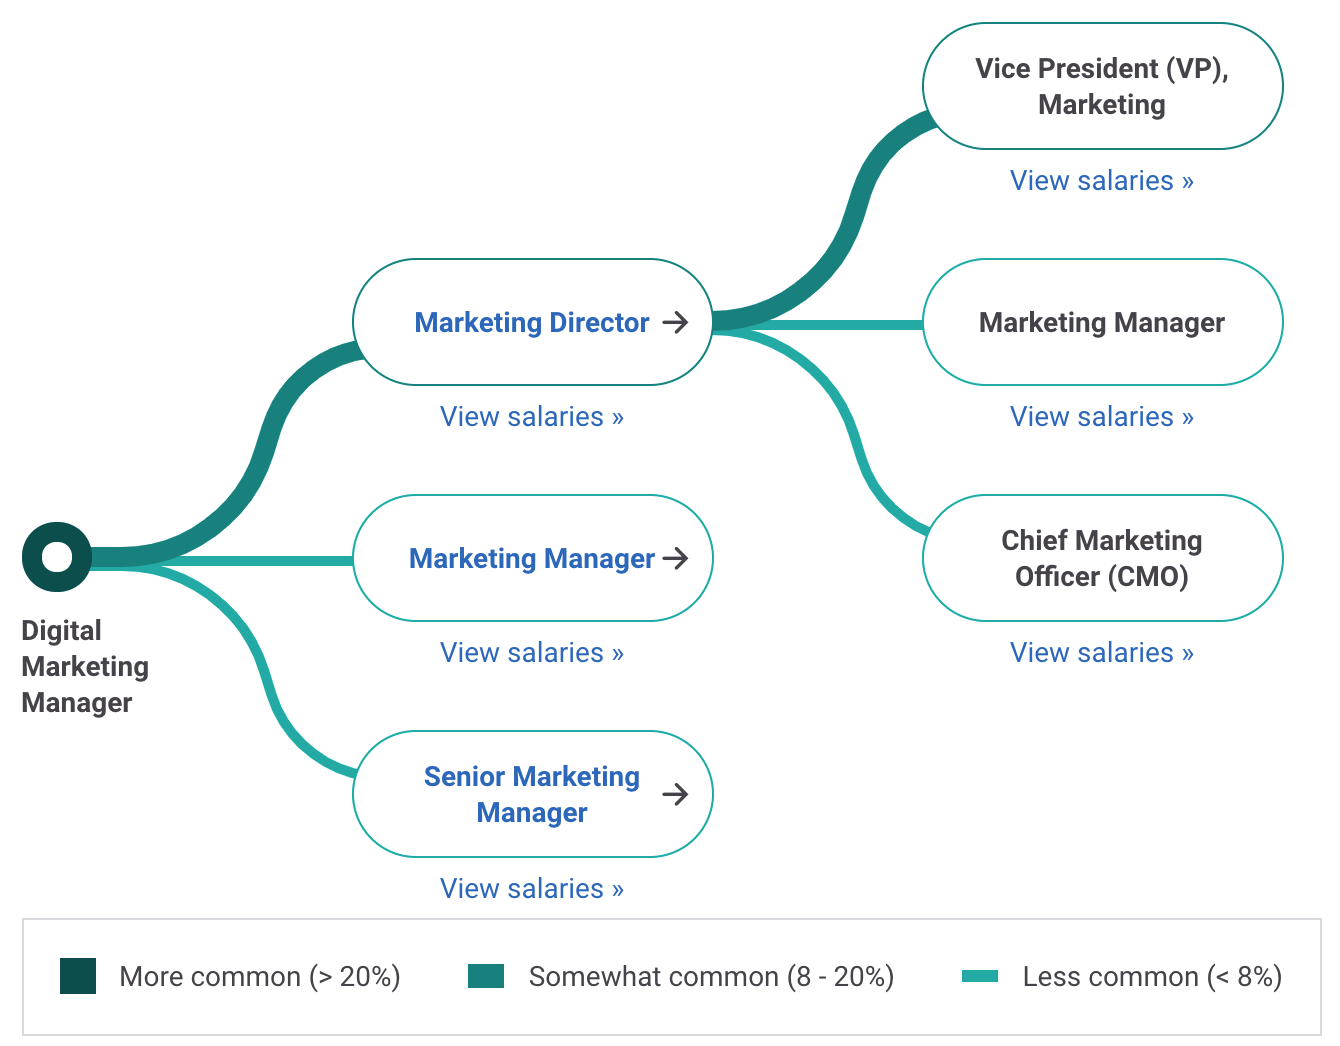 Digital Marketing Manager Career Path